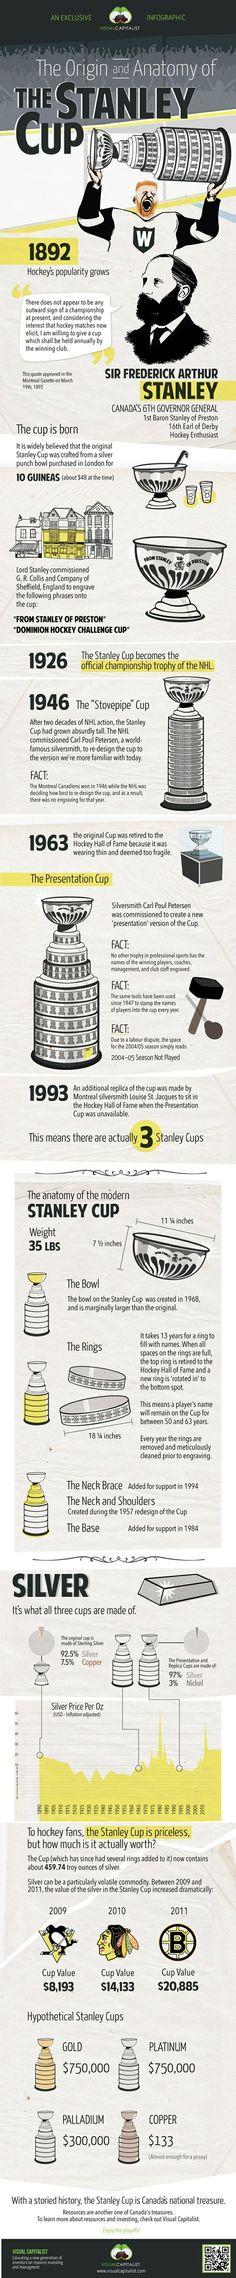 Origin of the Stanley Cup